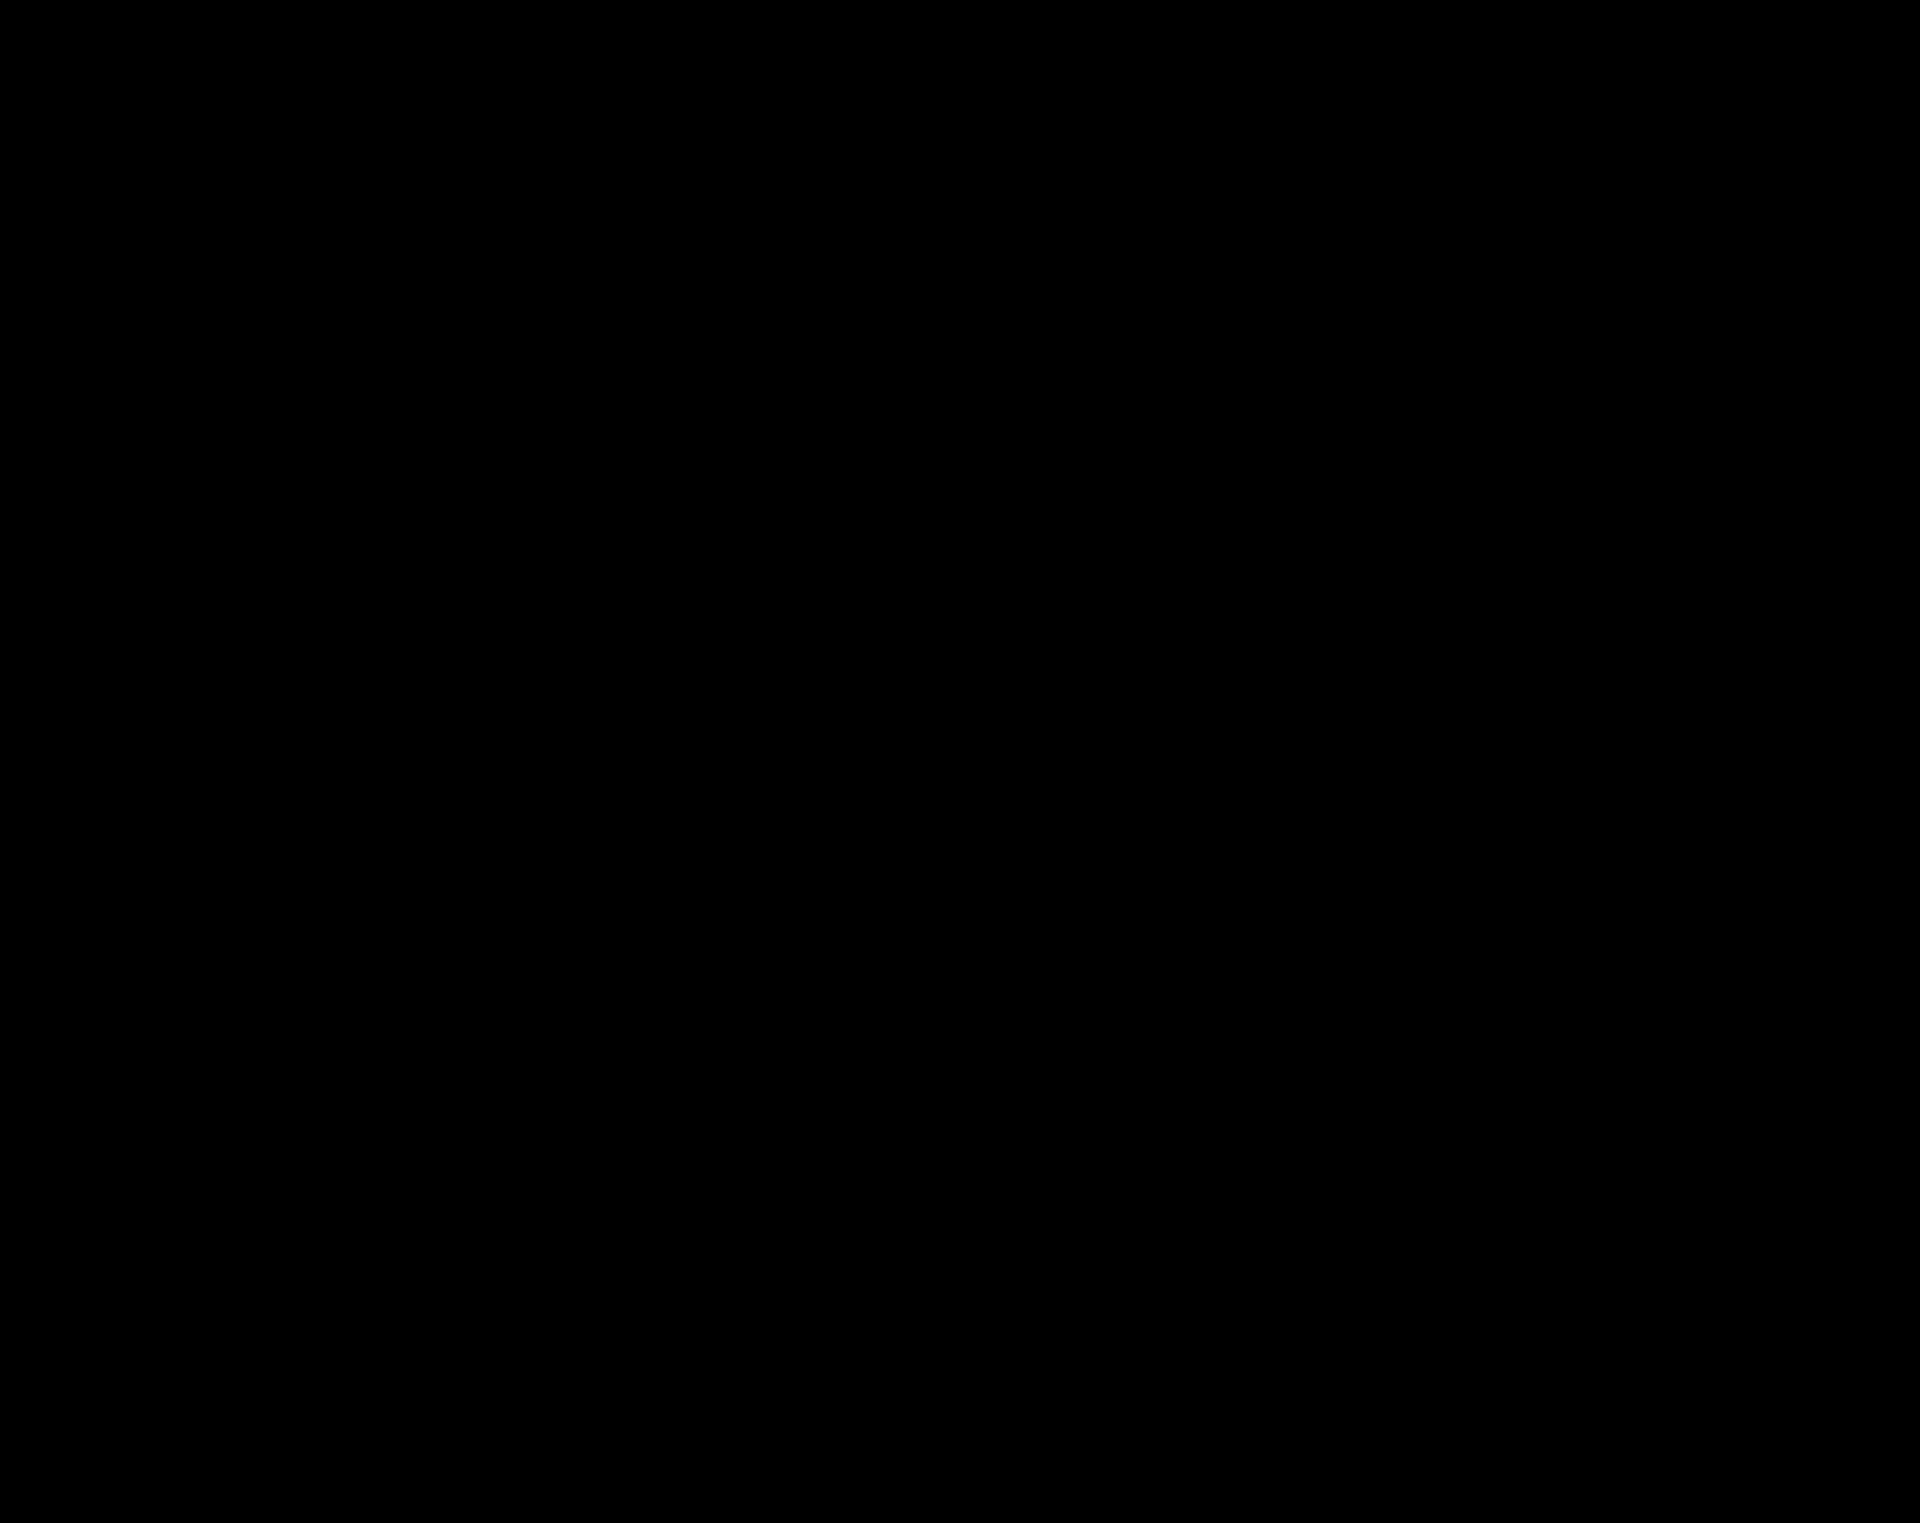 programmer-3606210.png